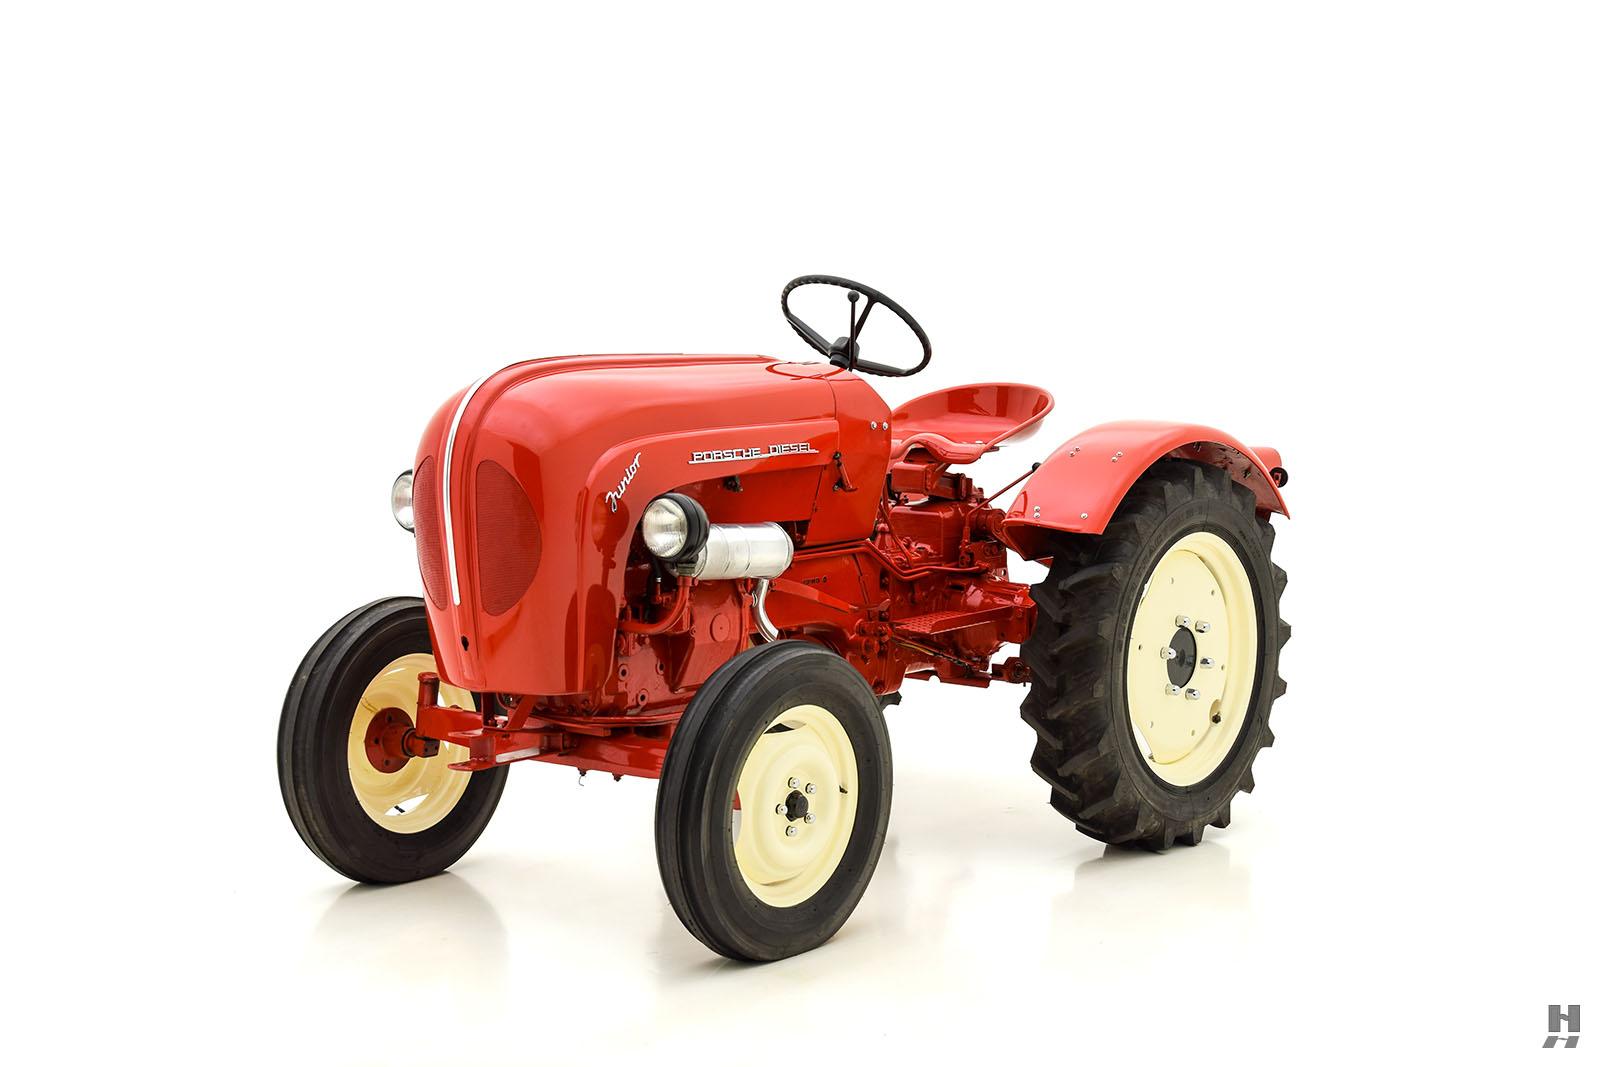 1960 Porsche Junior Tractor For Sale at Hyman LTD